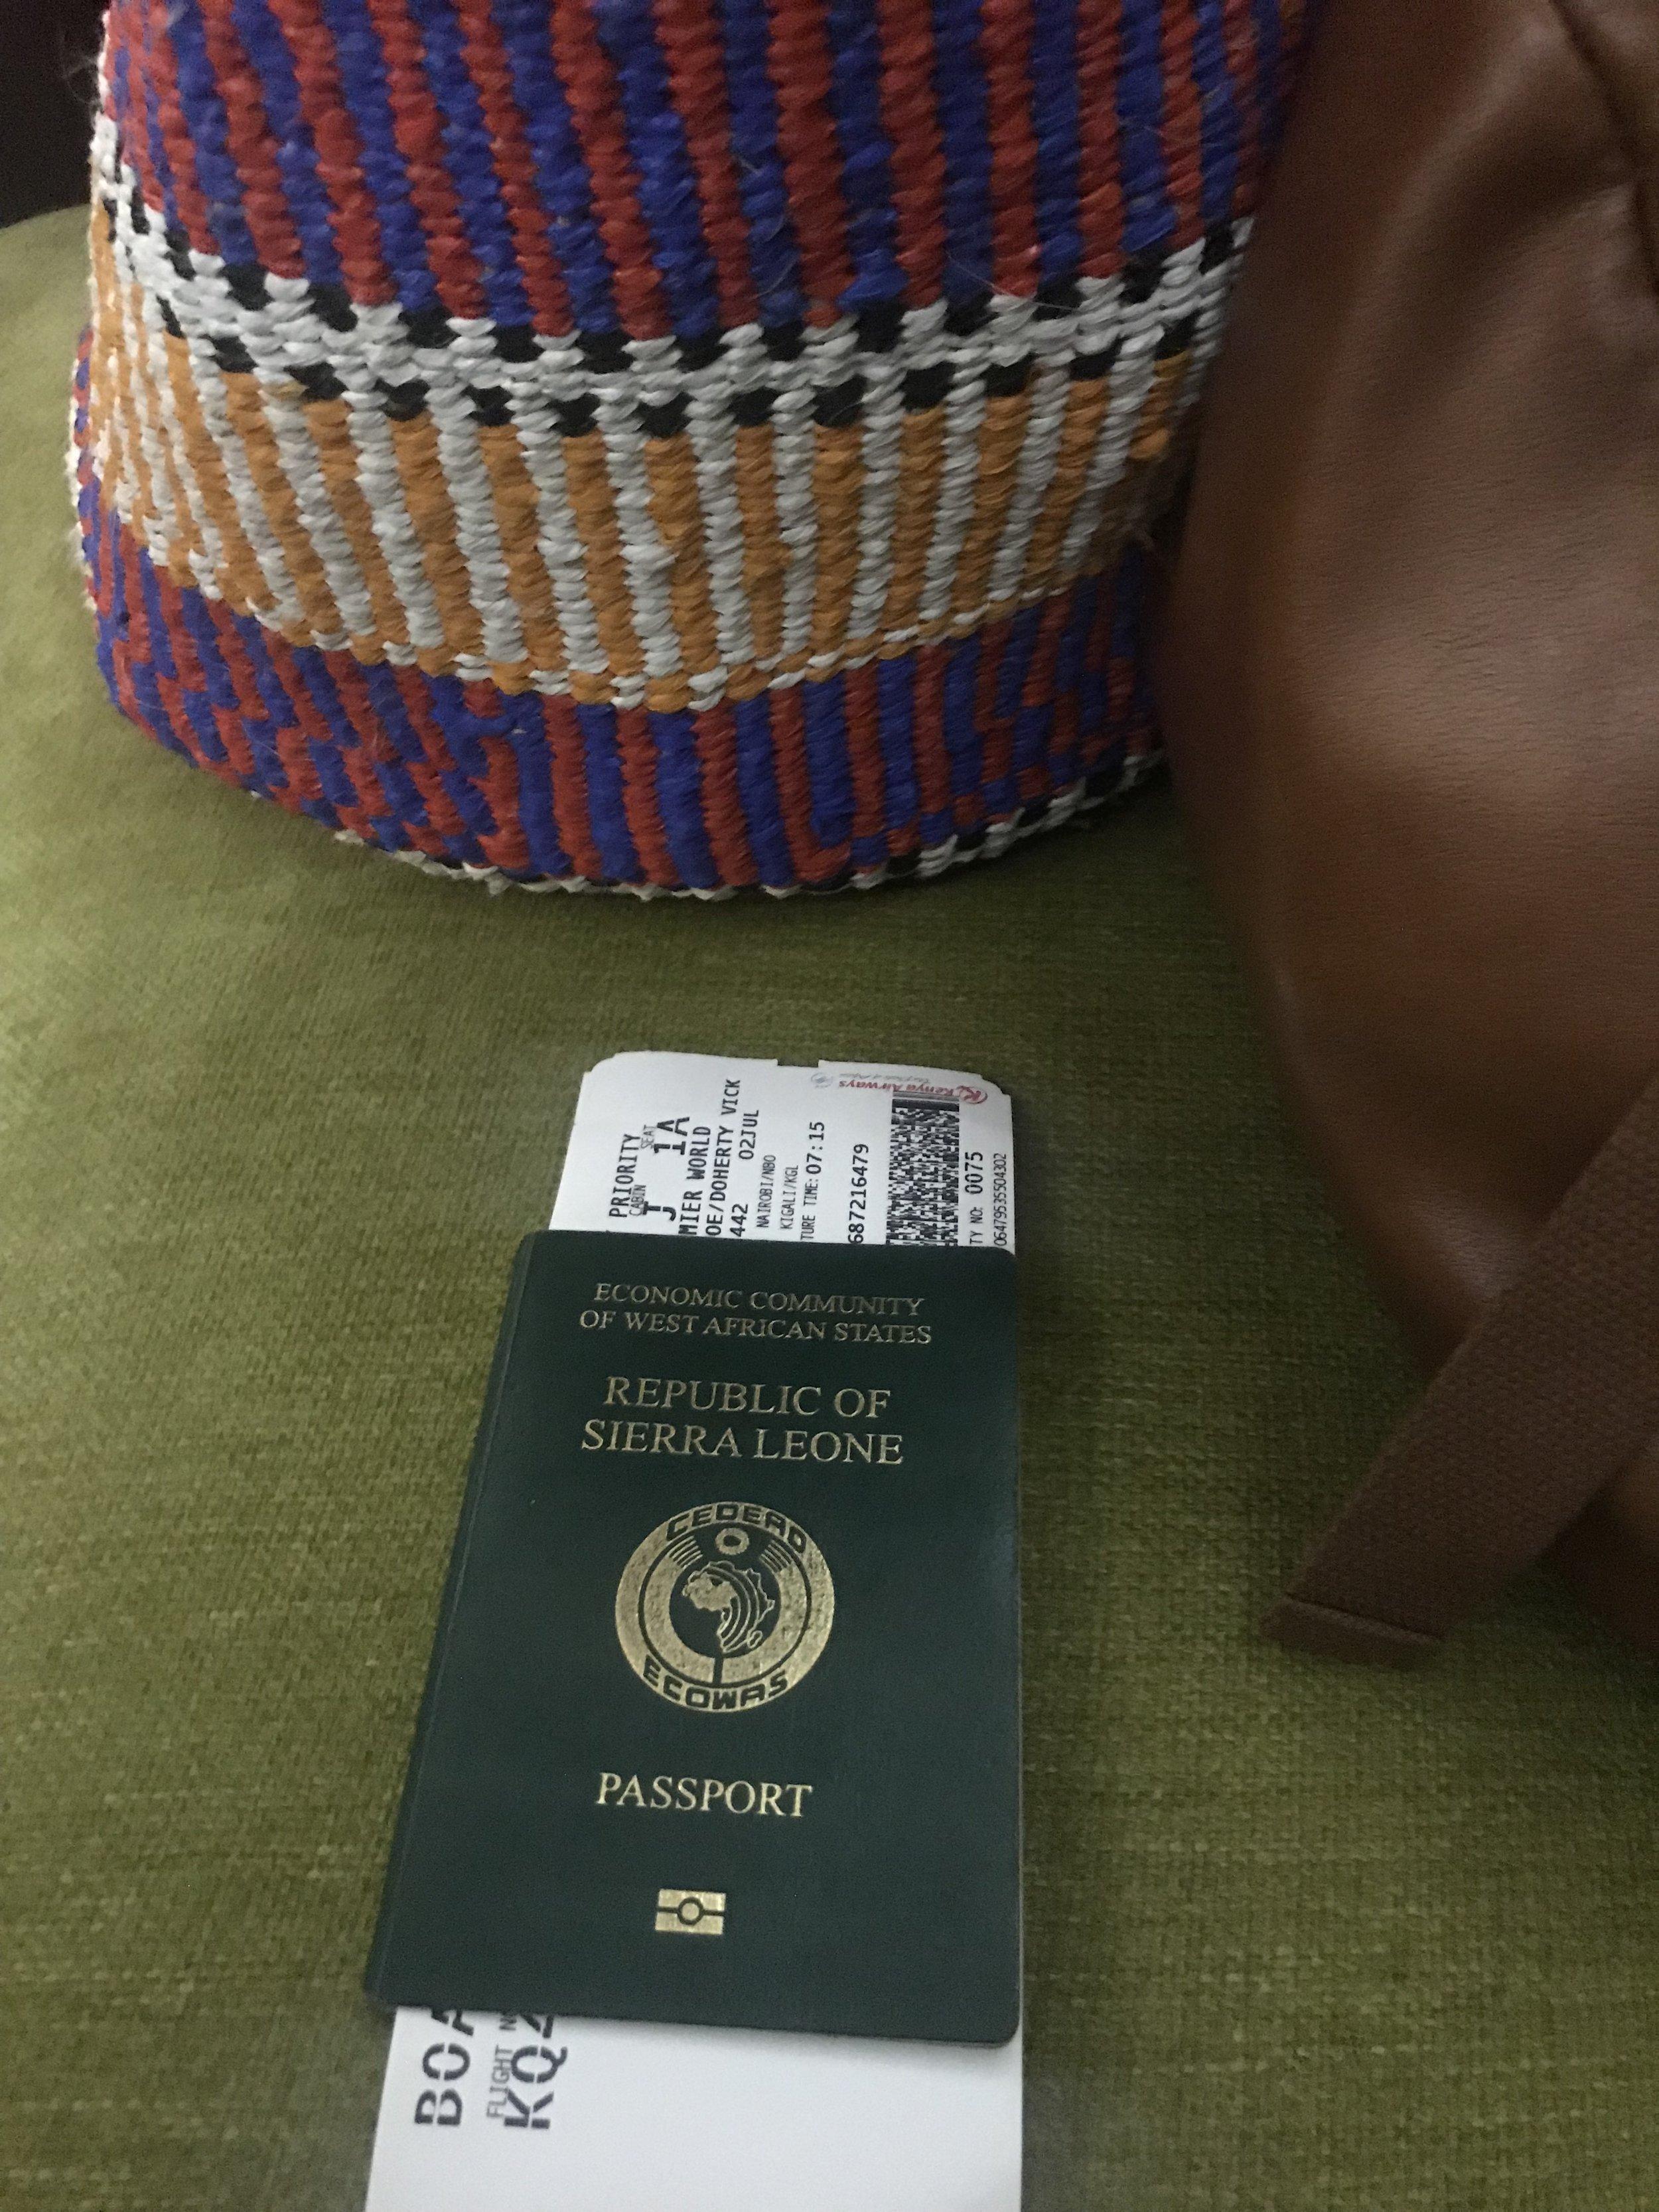 IMG_5556VickieRemoe-travel-kigali-rwanda-review-kwibohora25-hotels-africa.JPG